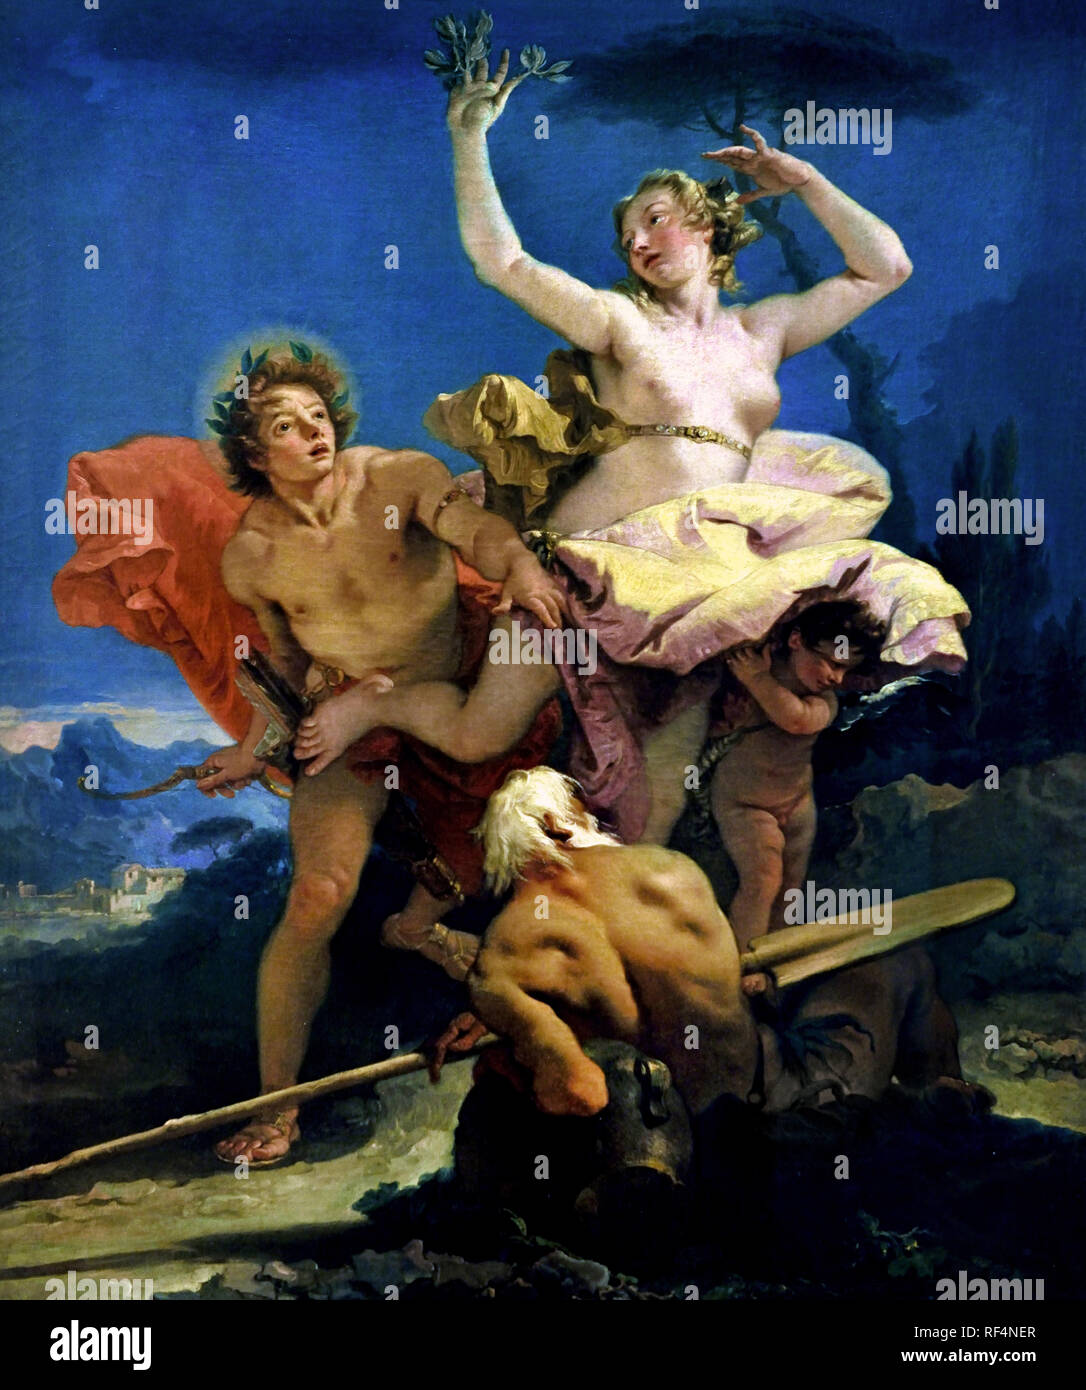 Apollo and Daphne 1743 - 1744 Giovanni Battista TIEPOLO 1696 - 1770  Italy, Italian, (Dramatic of Ovid's Metamorphoses Apollo's Ride and Daphne's Transformation) - Stock Image